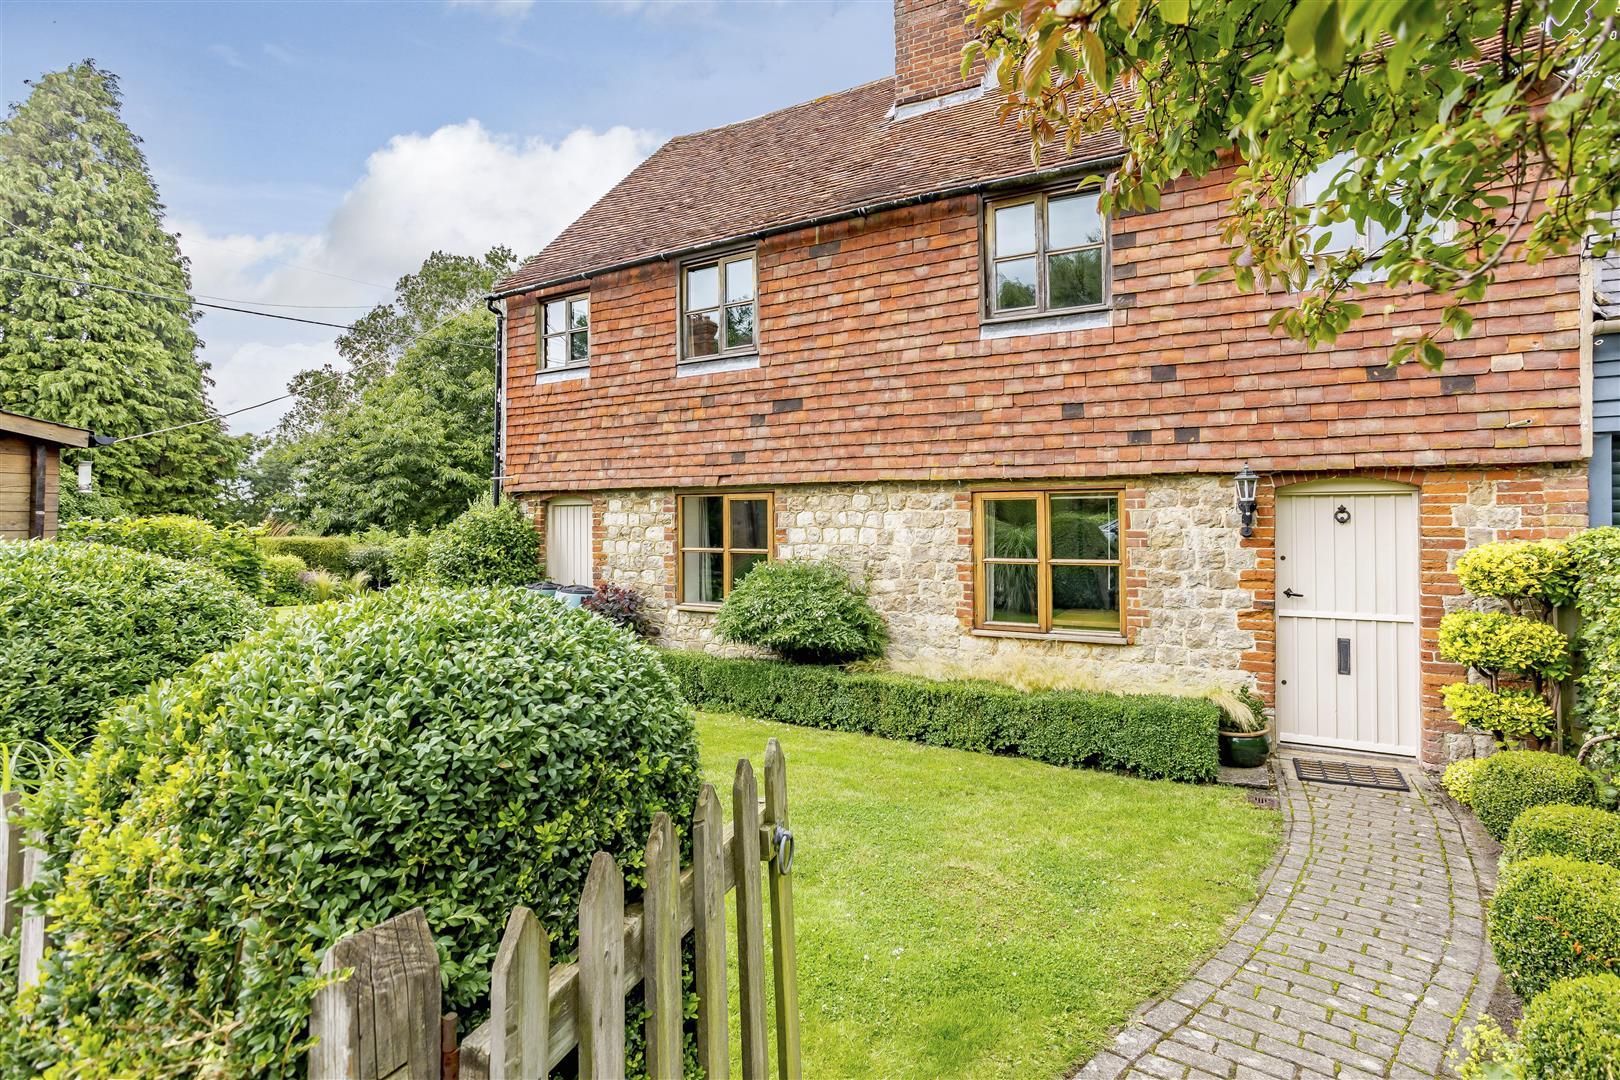 attractive 3 bed cottage in Otham village Kent